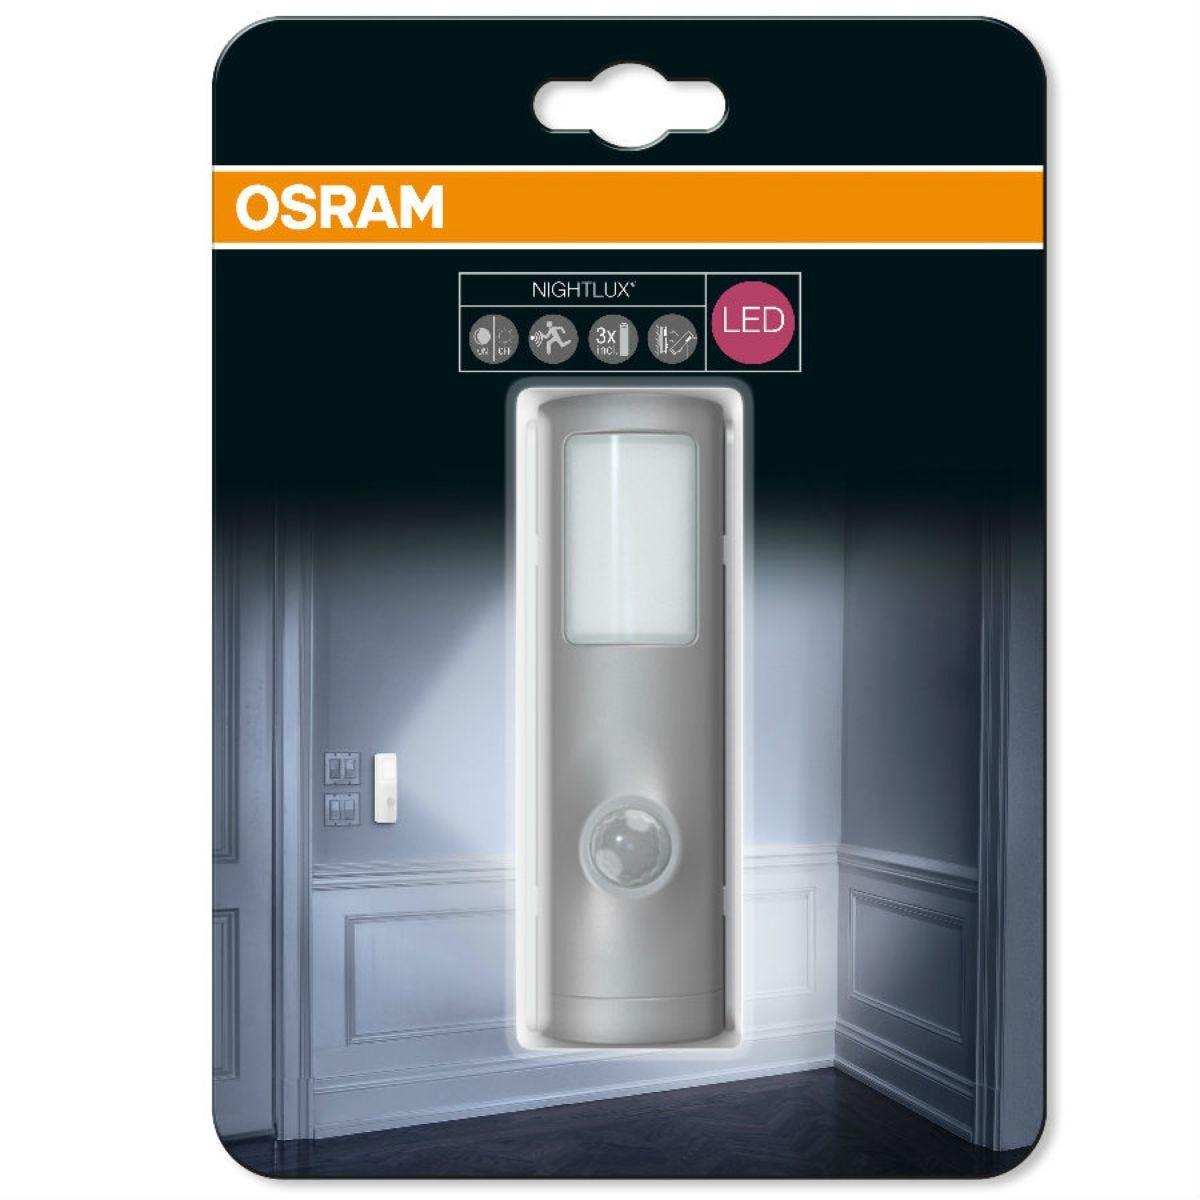 Osram Nightlux Torch Light - Silver